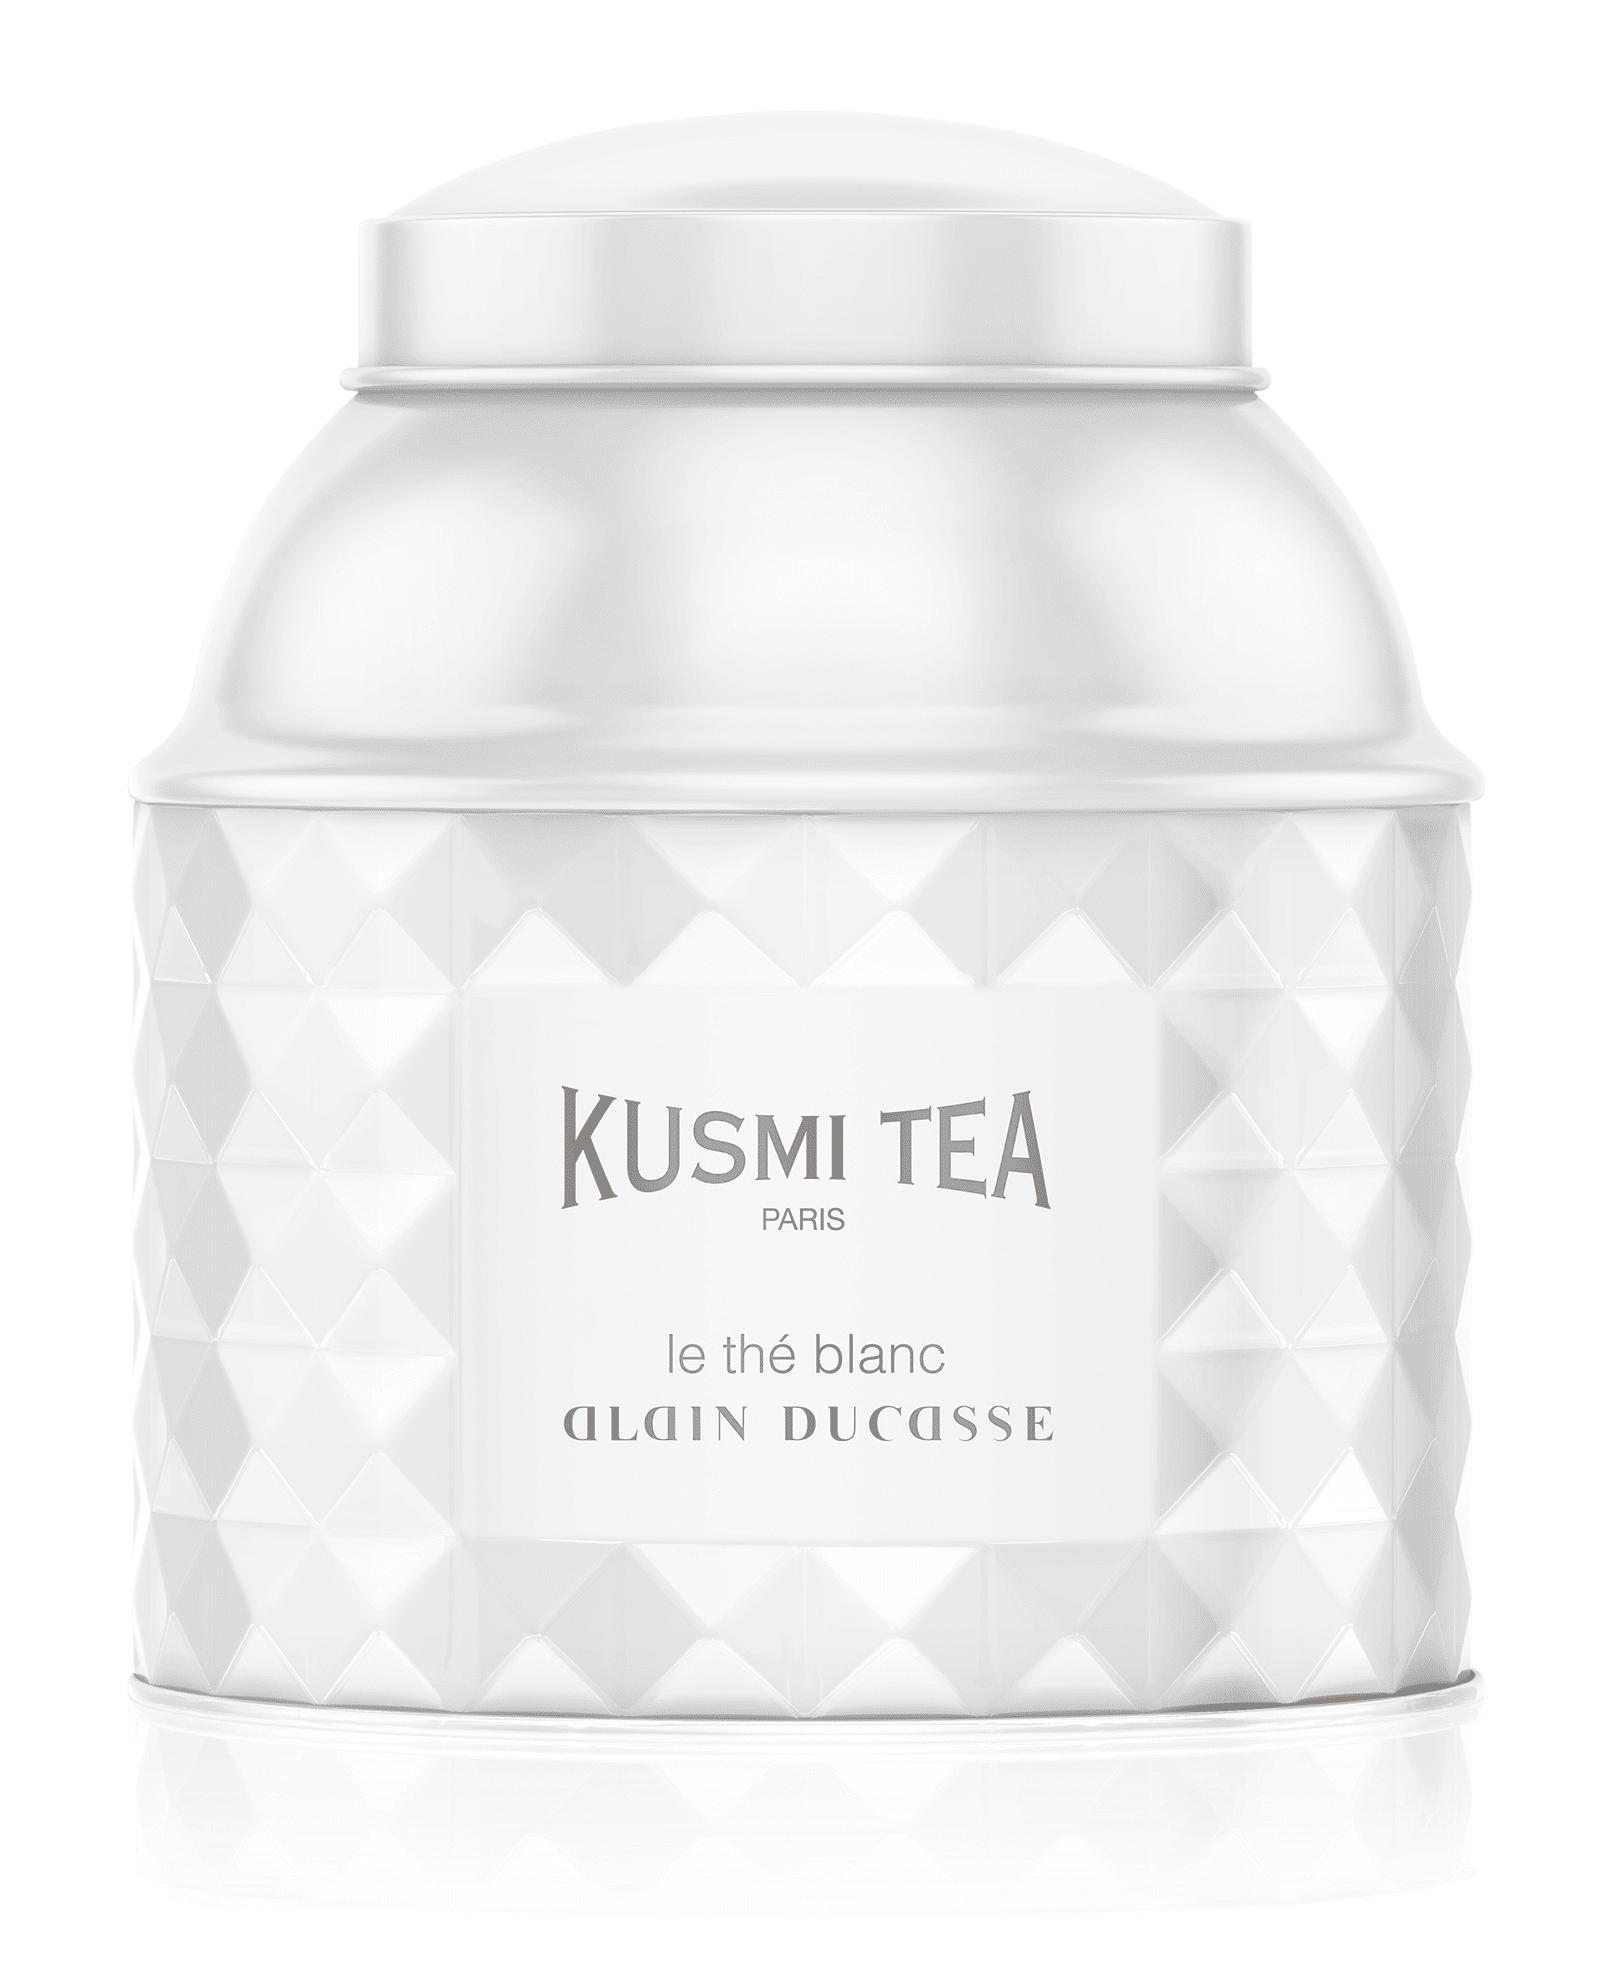 KUSMI TEA Le Thé Blanc Alain Ducasse - Thé blanc aromatisé framboise et rose - Kusmi Tea